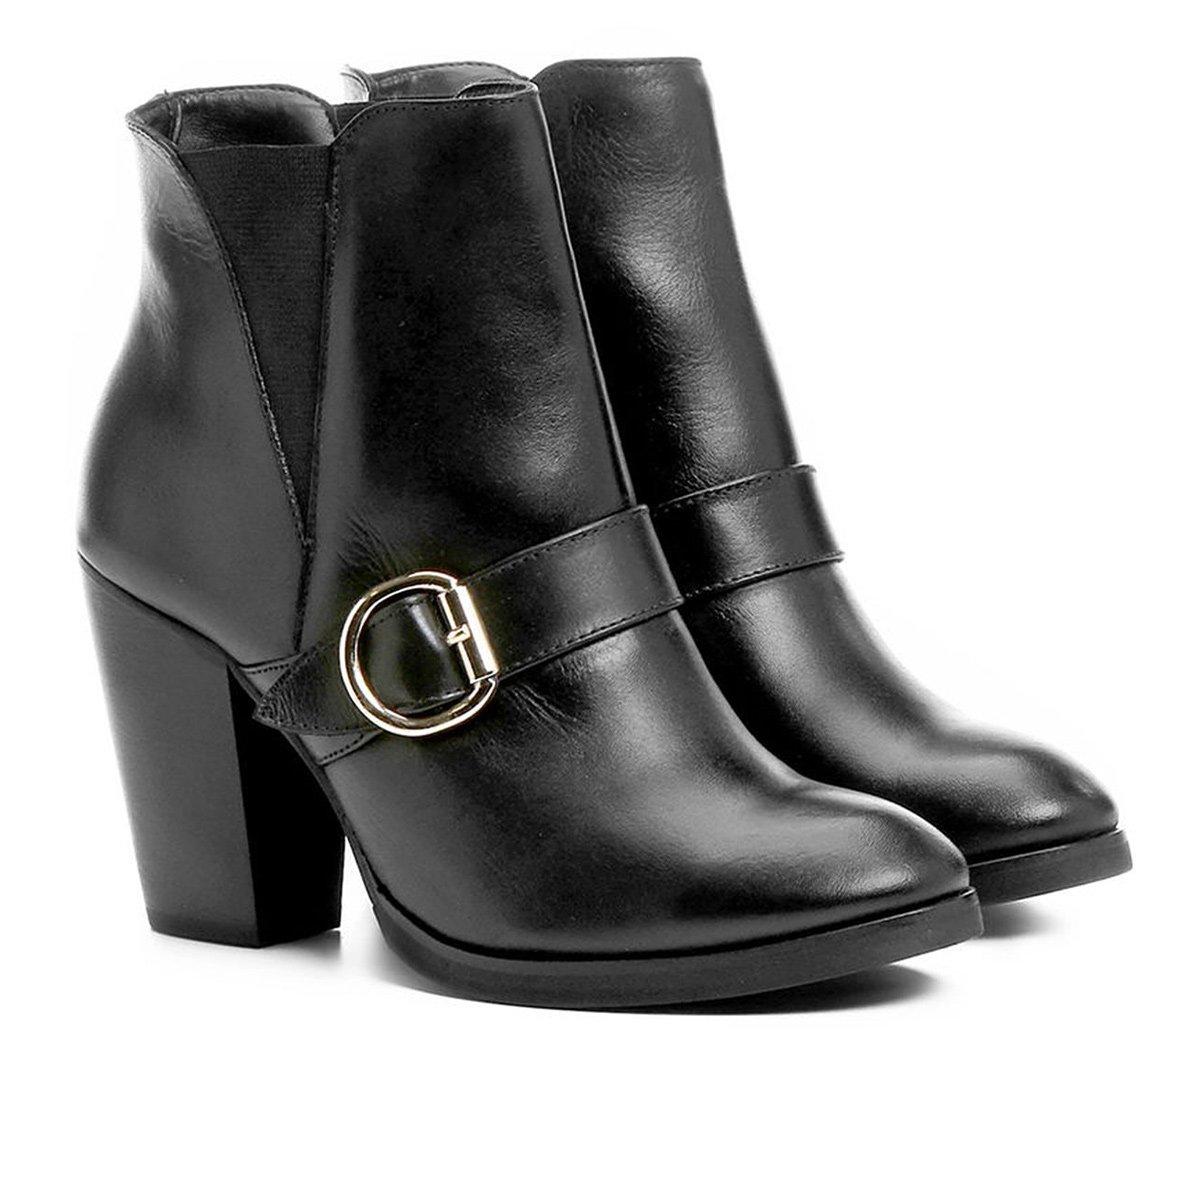 aa81fb4ee0 ... Couro Cano Curto Shoestock Fivela Feminina